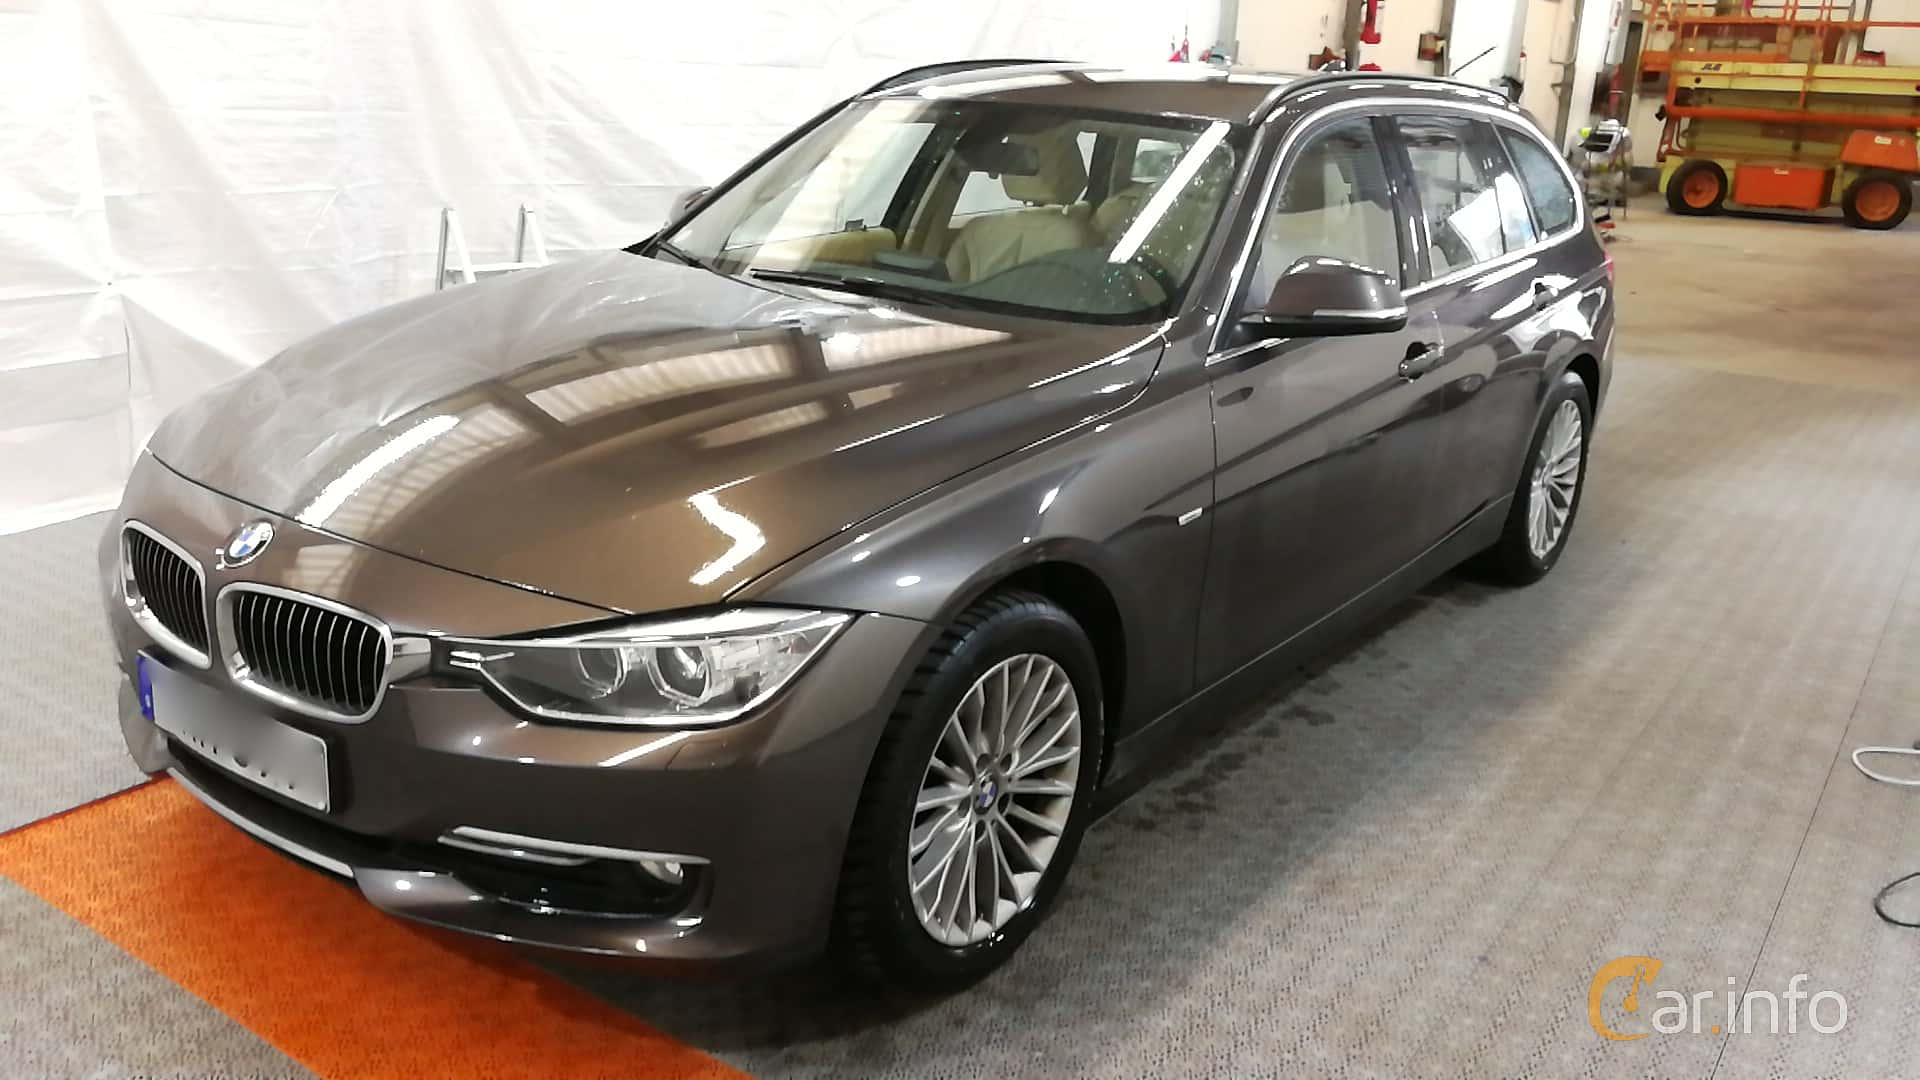 BMW 318d Touring Manual, 143hp, 2015